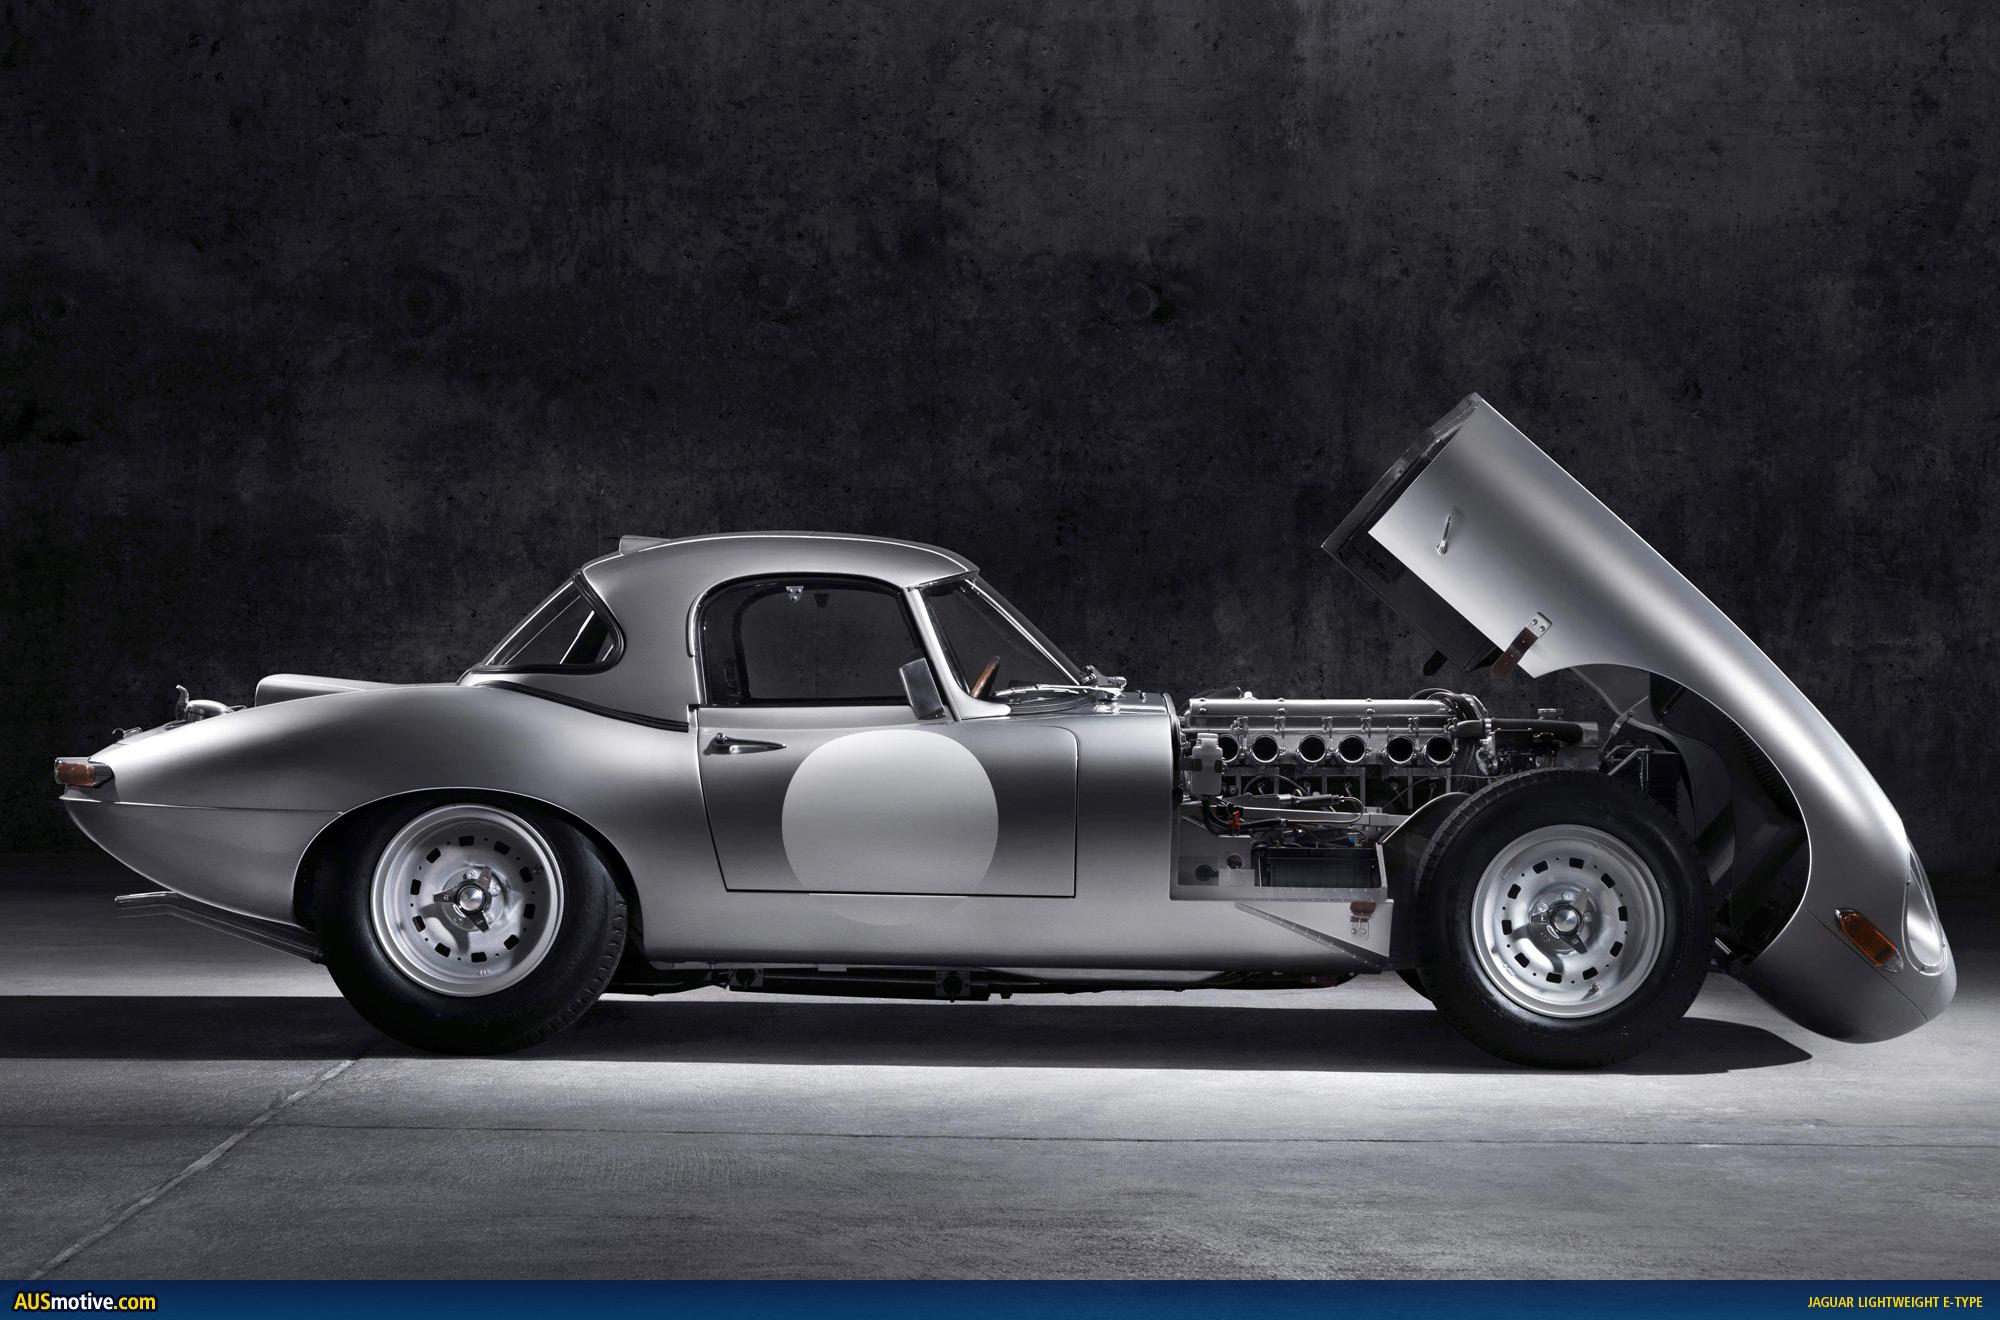 Jaguar E Type >> AUSmotive.com » Jaguar Lightweight E-Type revealed